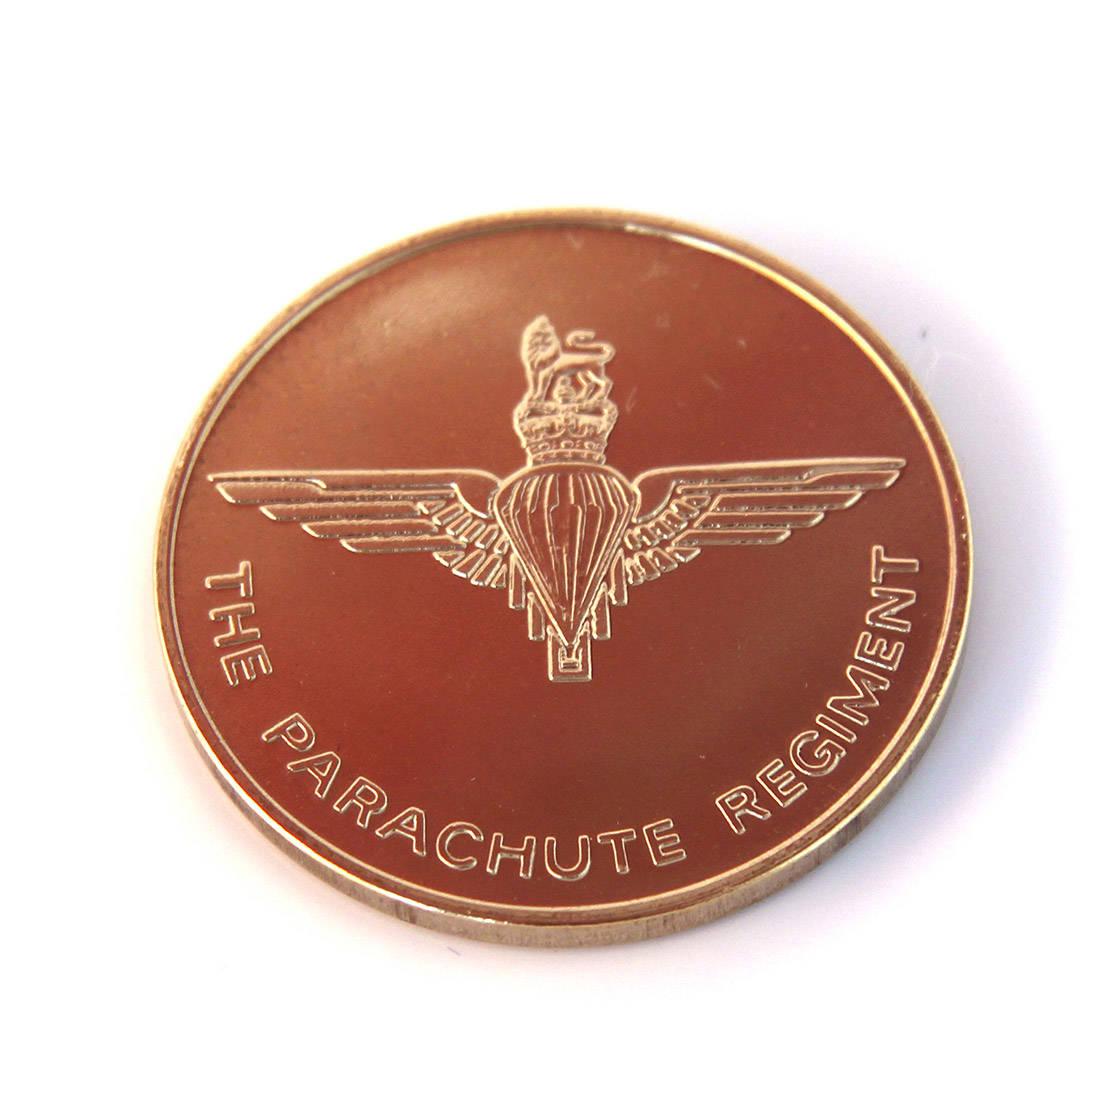 Parachute Regiment Fridge Magnet (24ct Gold Plated, Round)